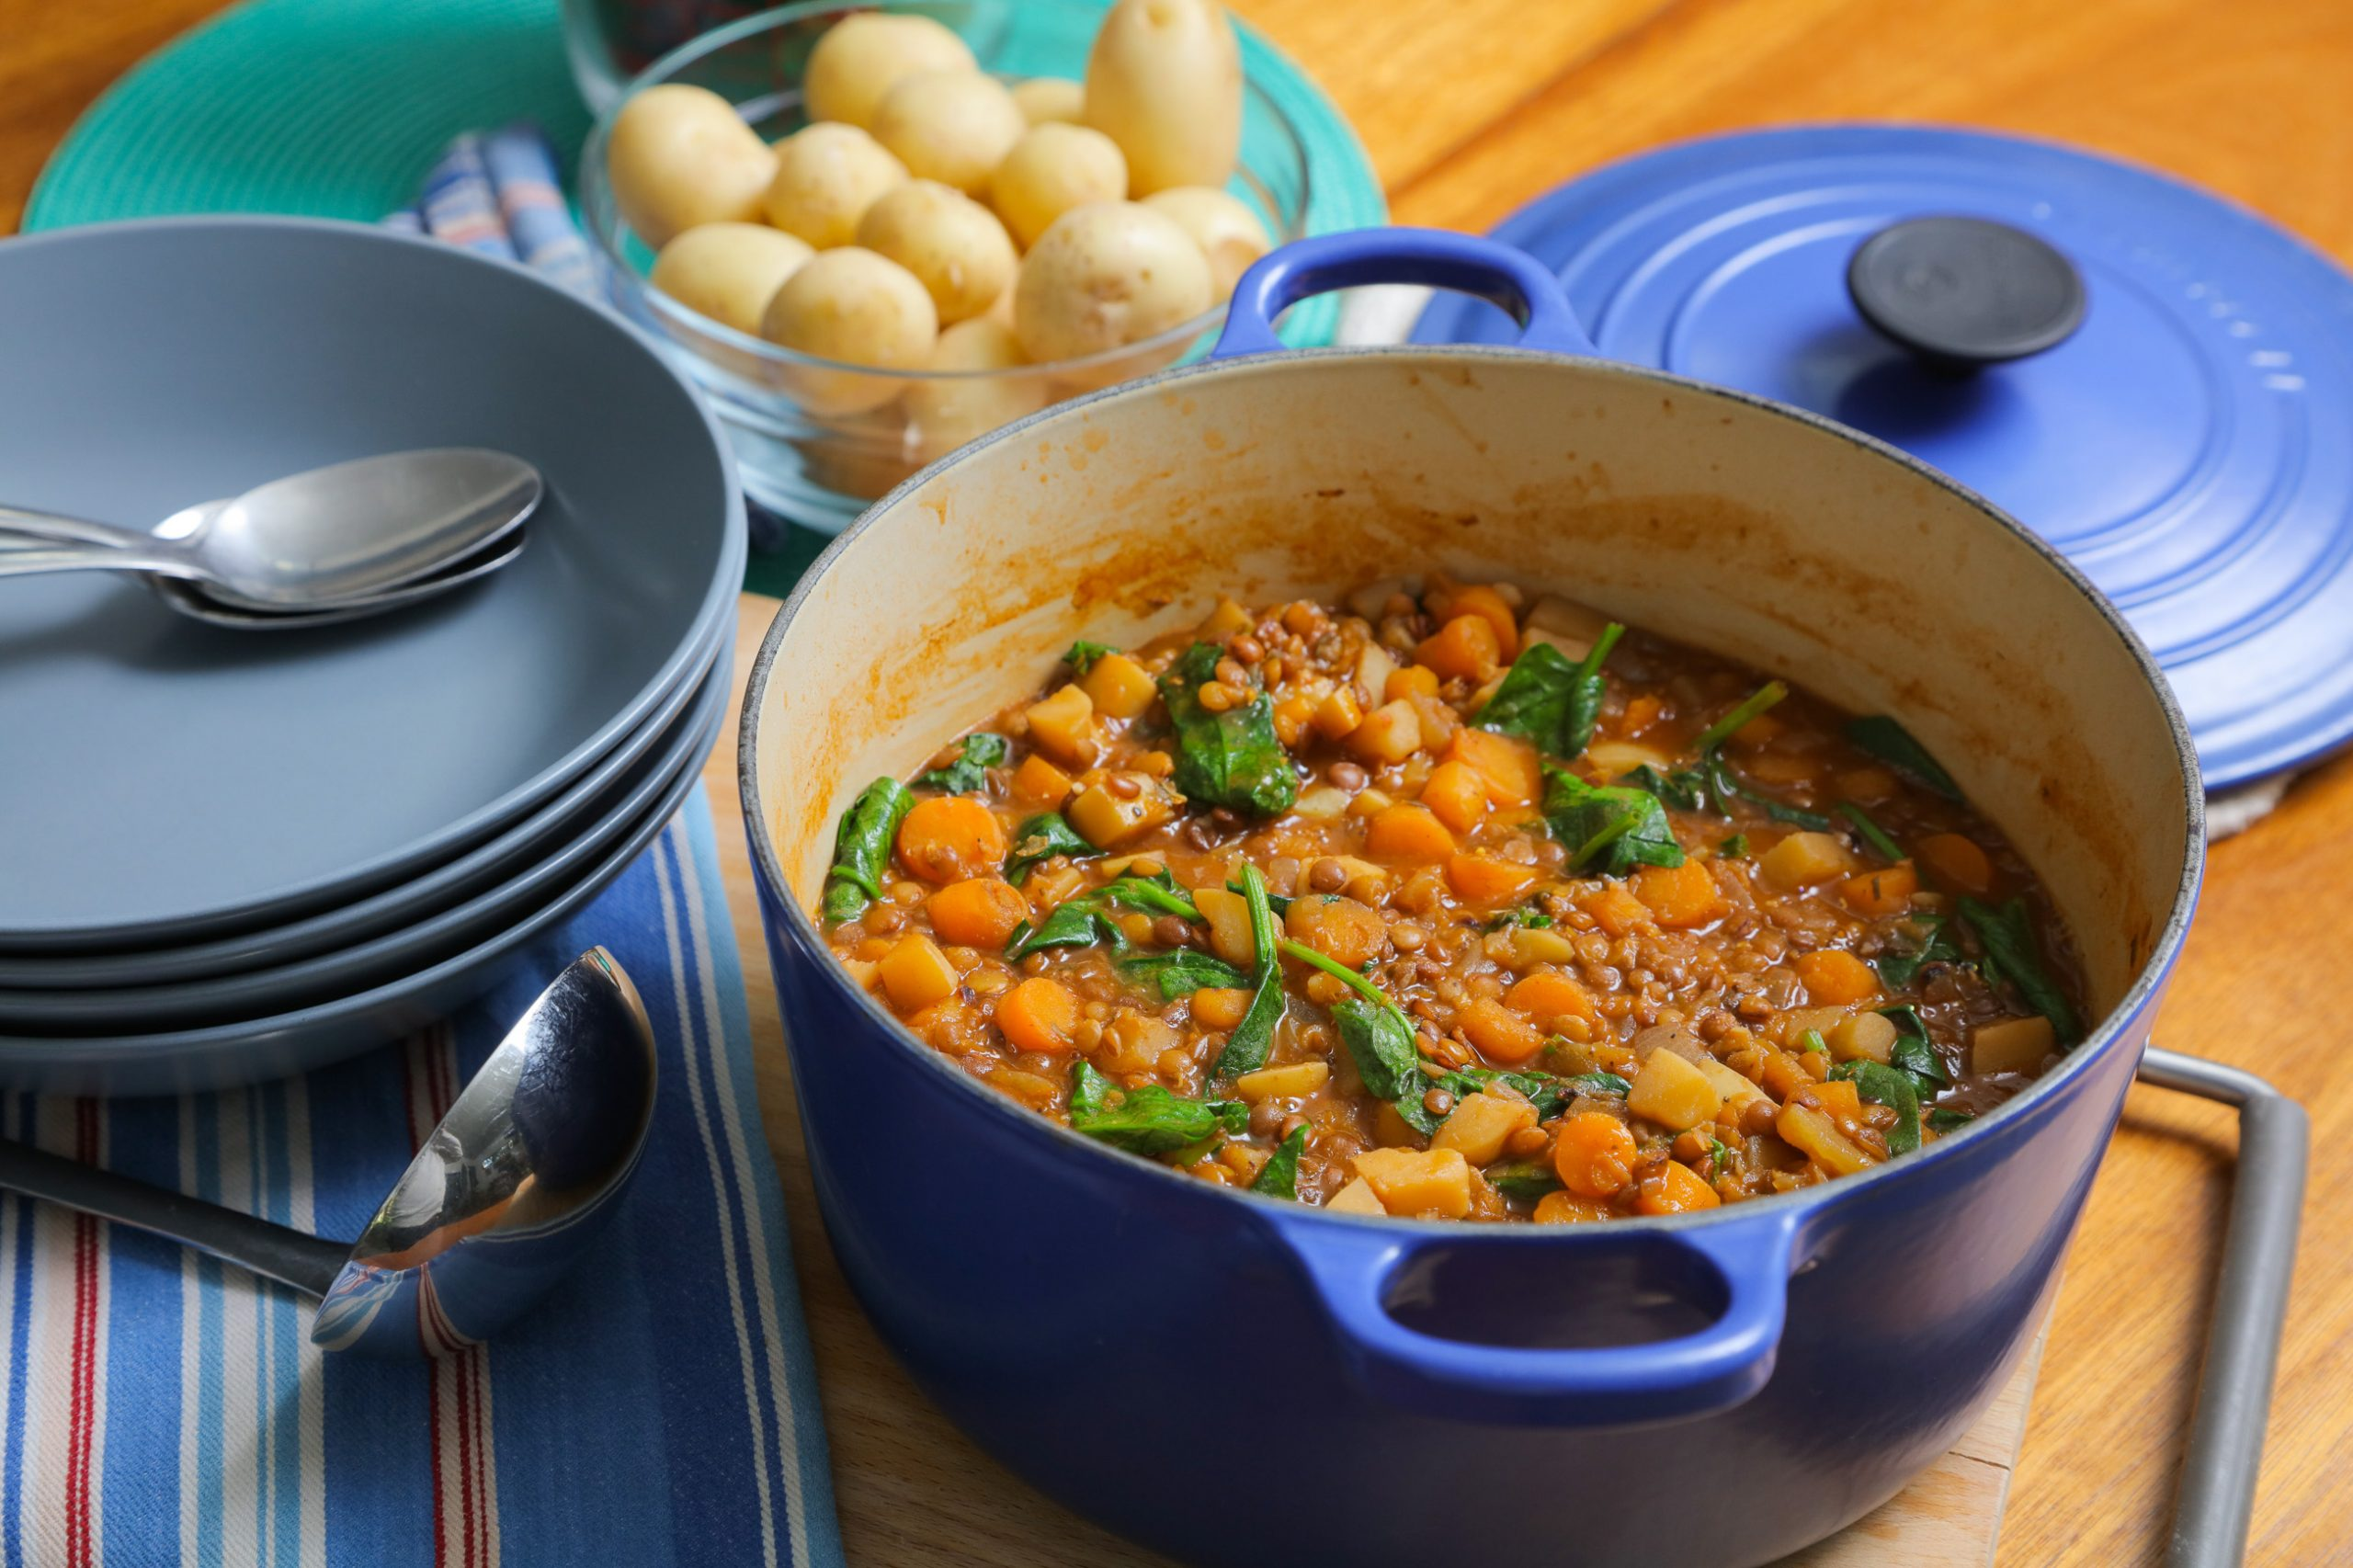 vegan lentil and vegetable stew recipe